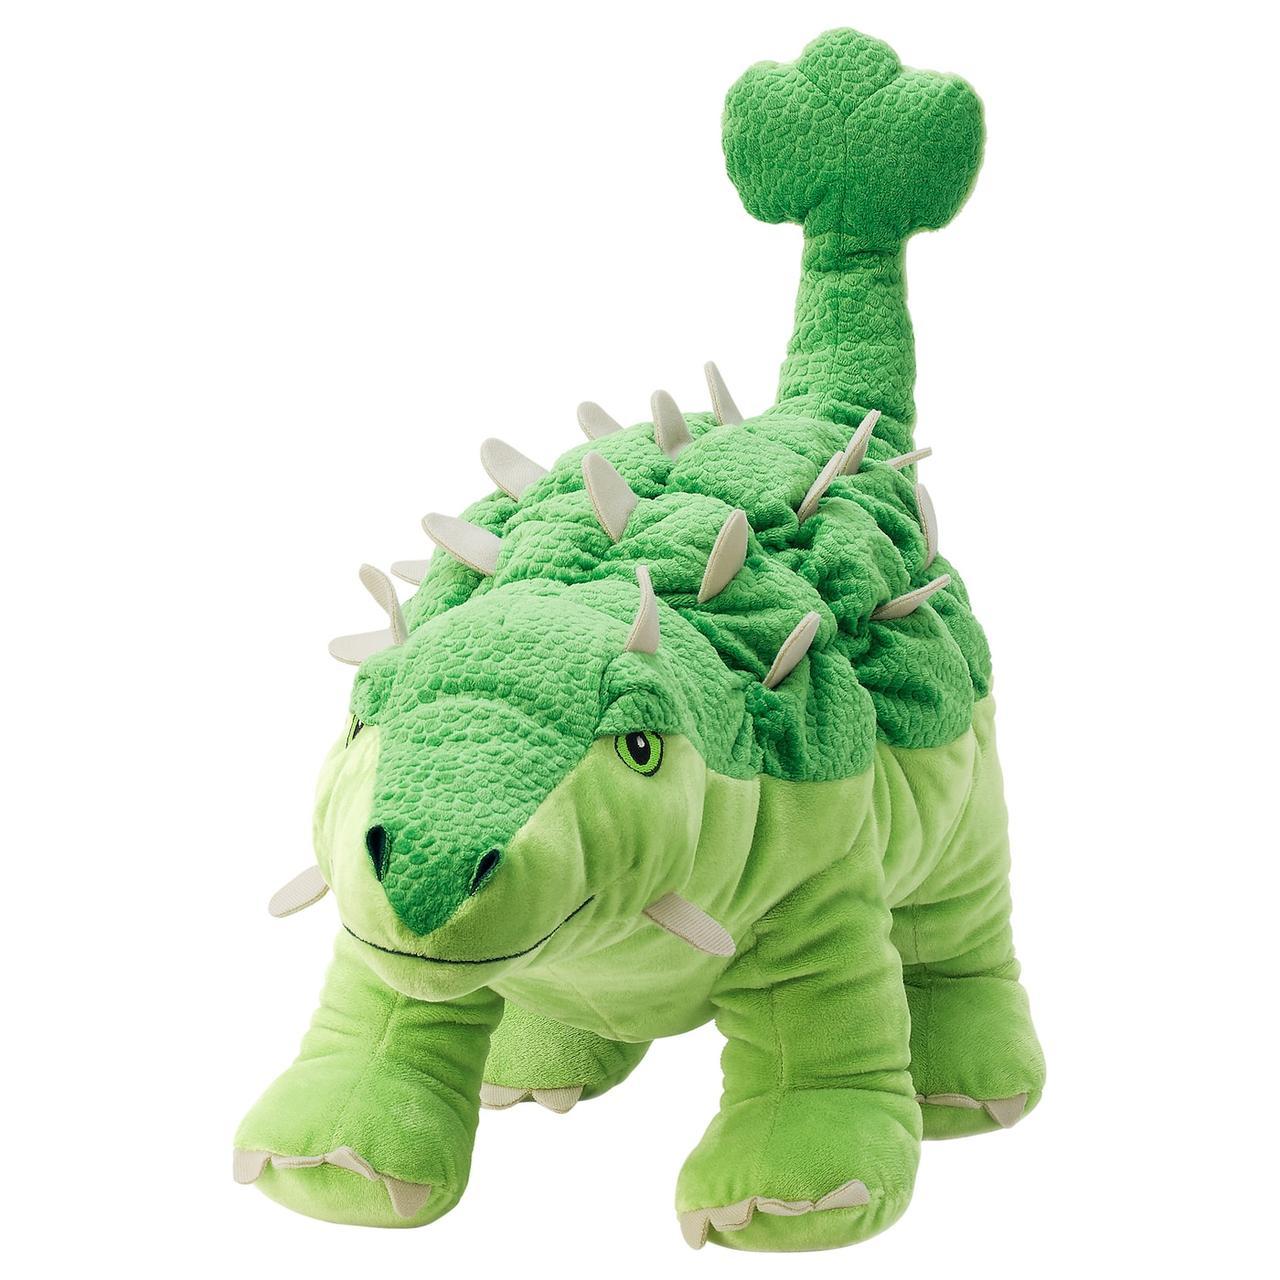 IKEA JÄTTELIK Мягкая игрушка, динозавр ankylosaurus 55 см